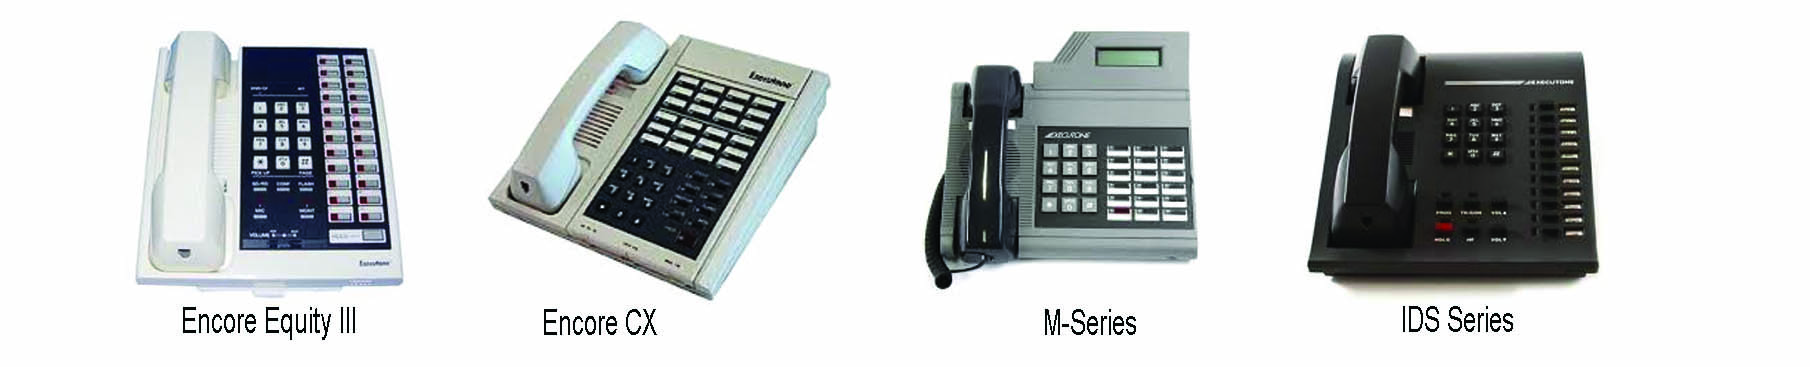 Executone Business Telephone Models